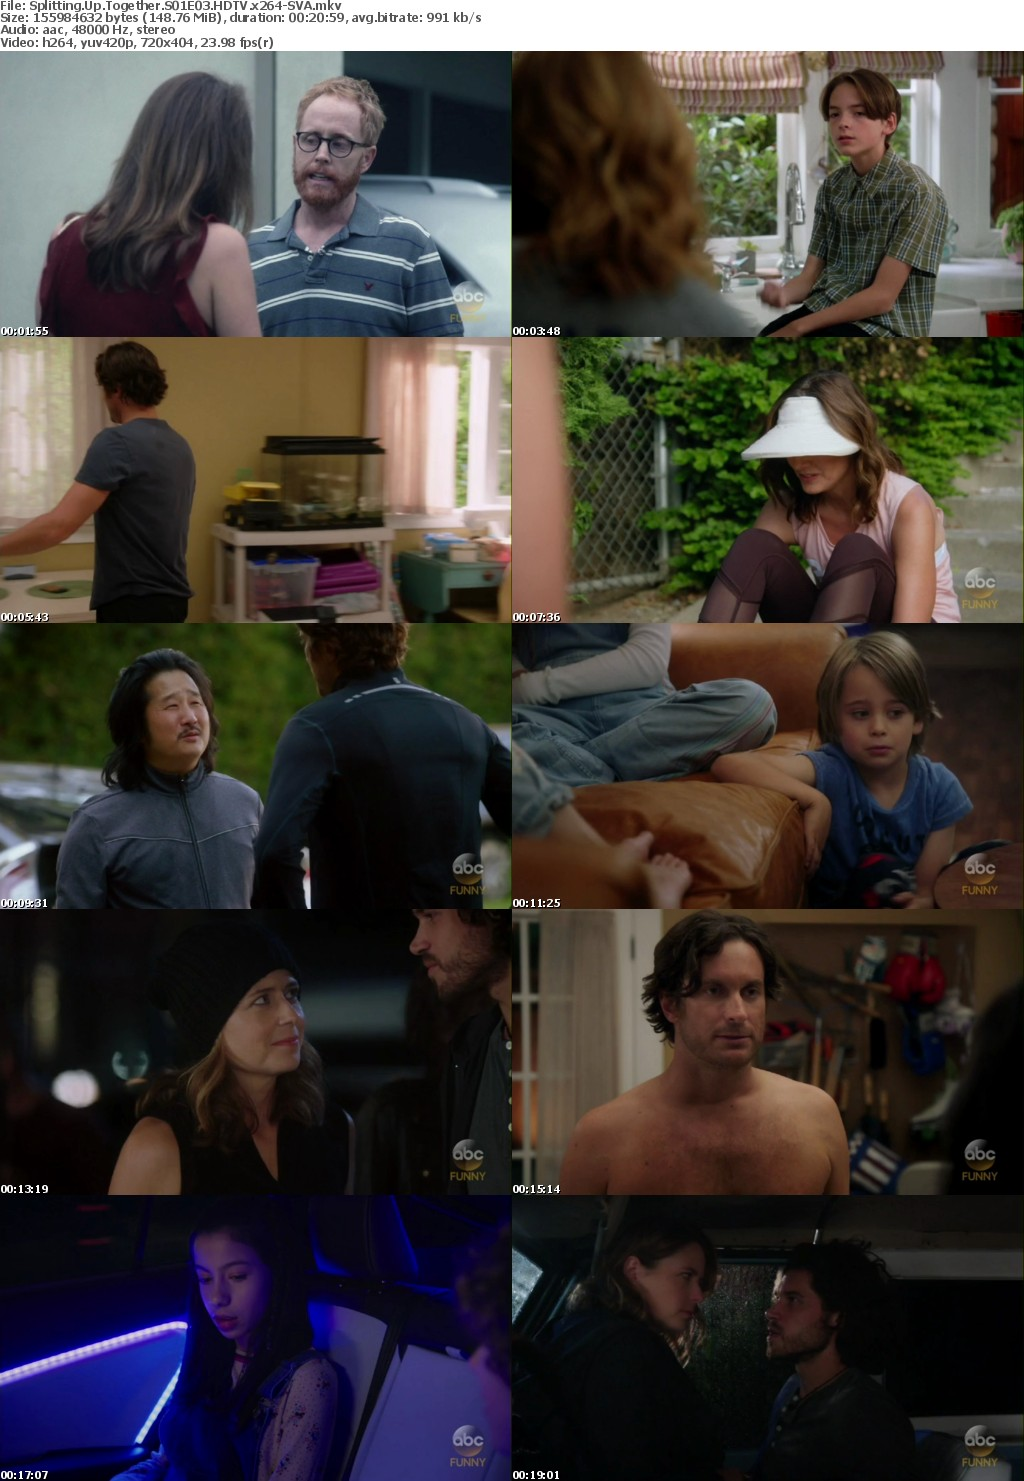 Splitting Up Together S01E03 HDTV x264-SVA